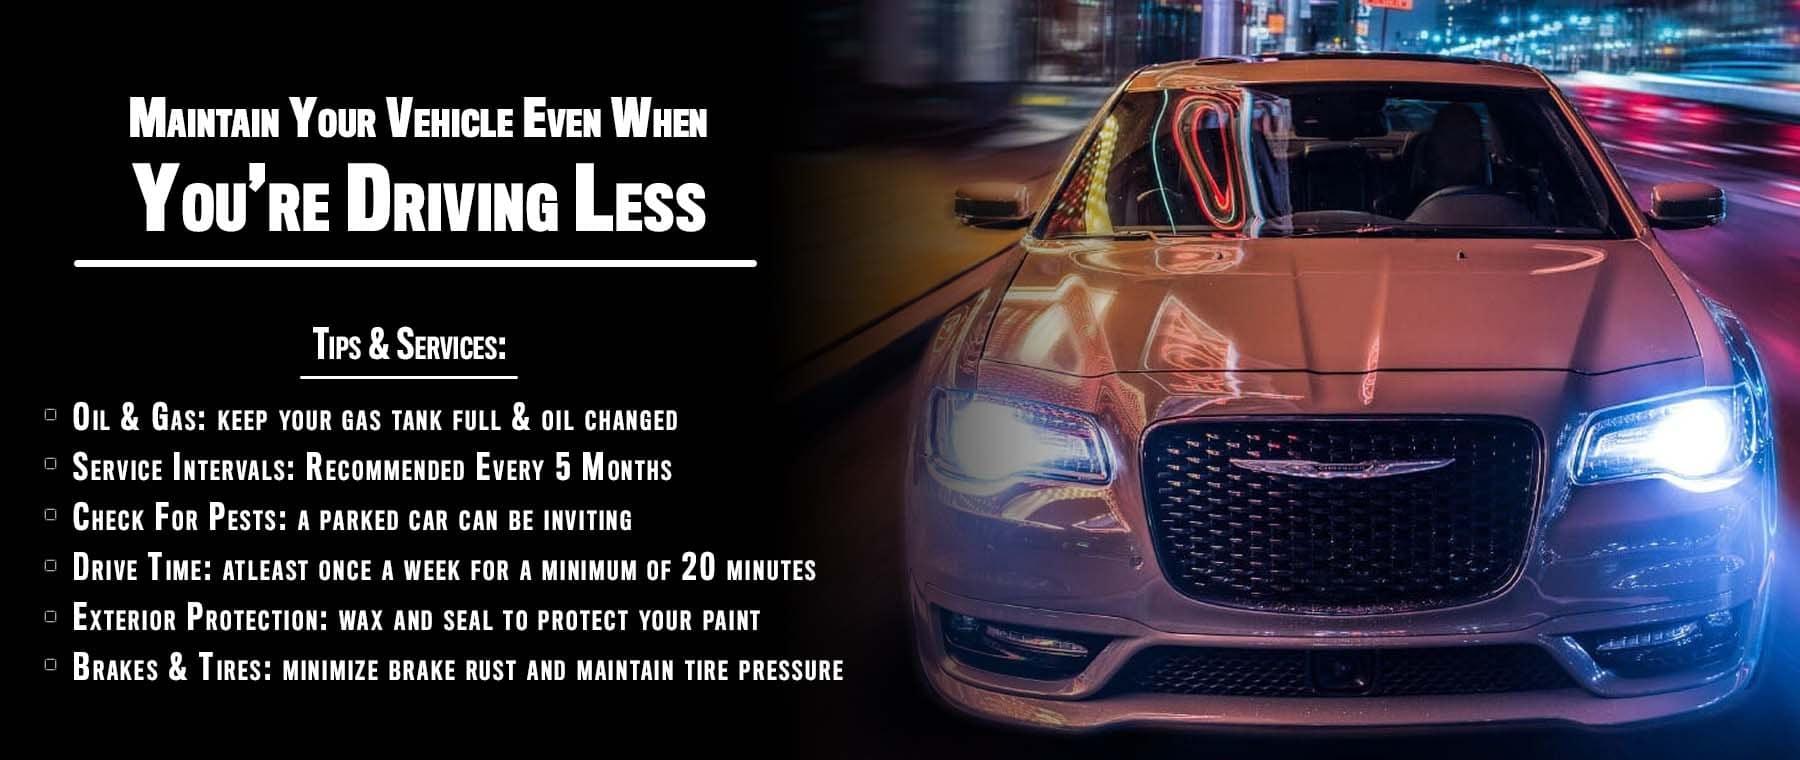 Vehicle Maintenance When Driving Less